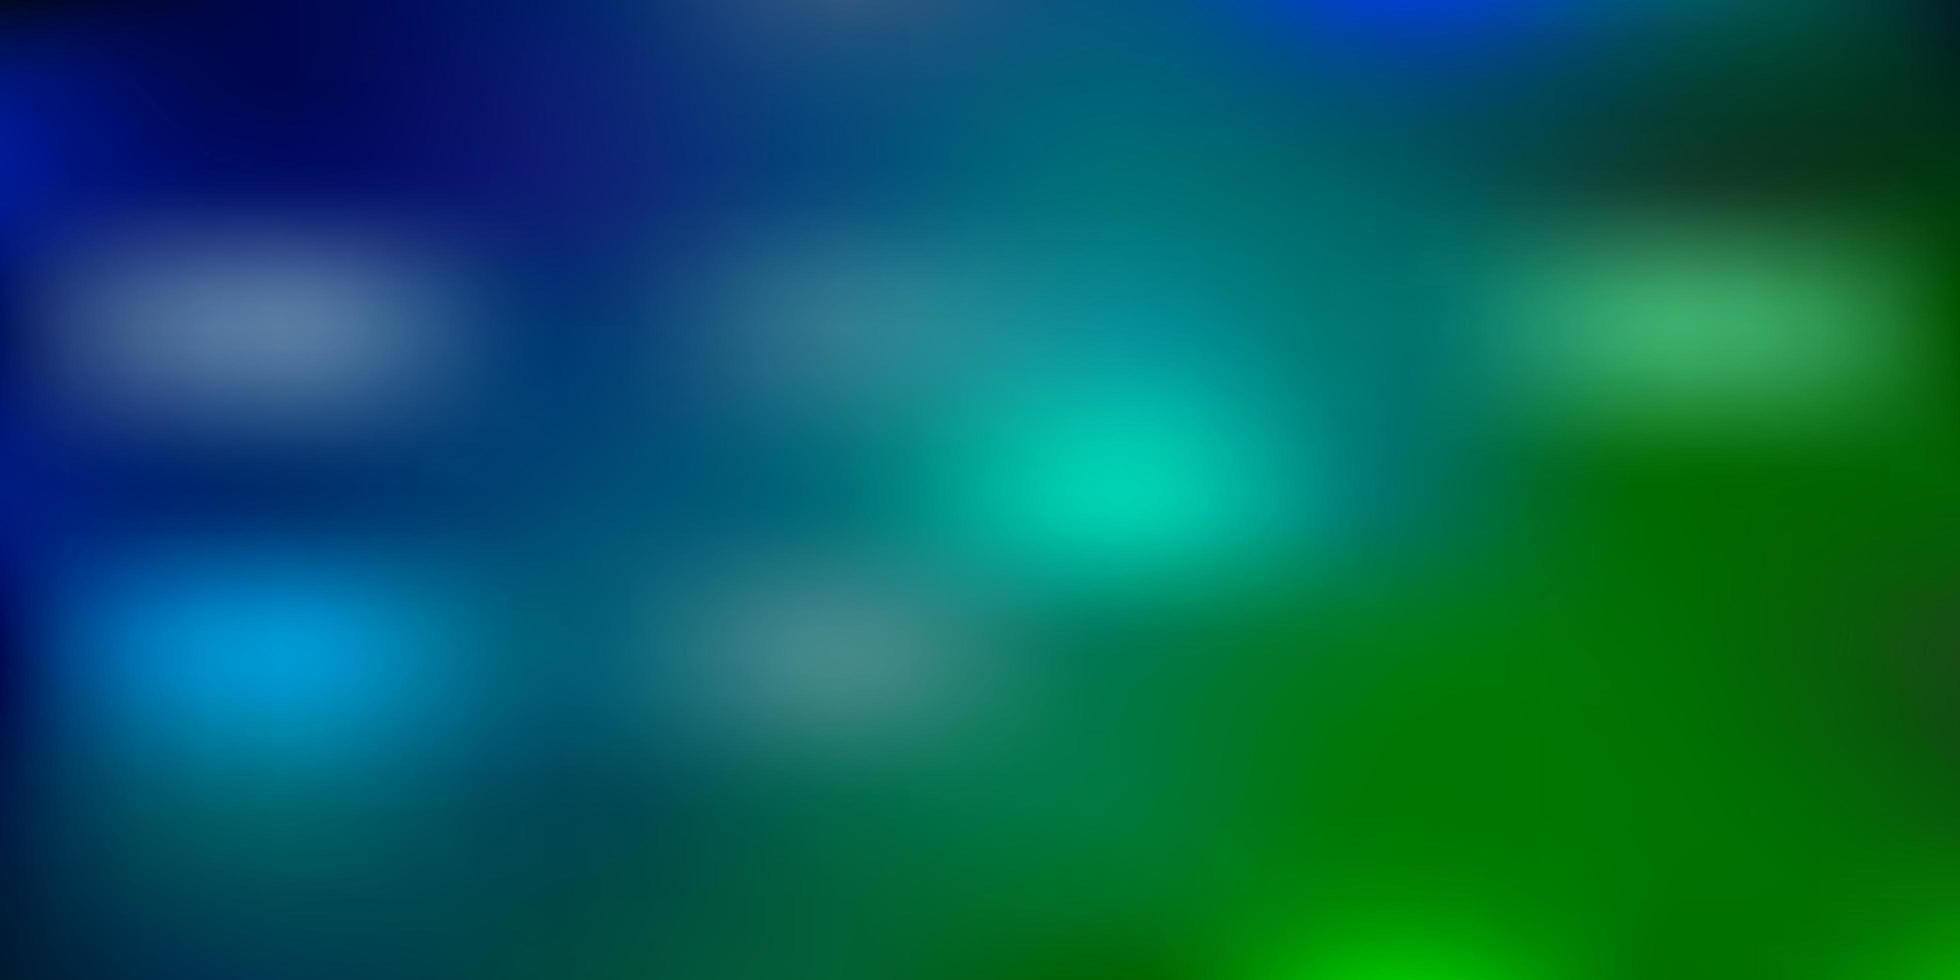 azul claro, verde vetor turva layout.